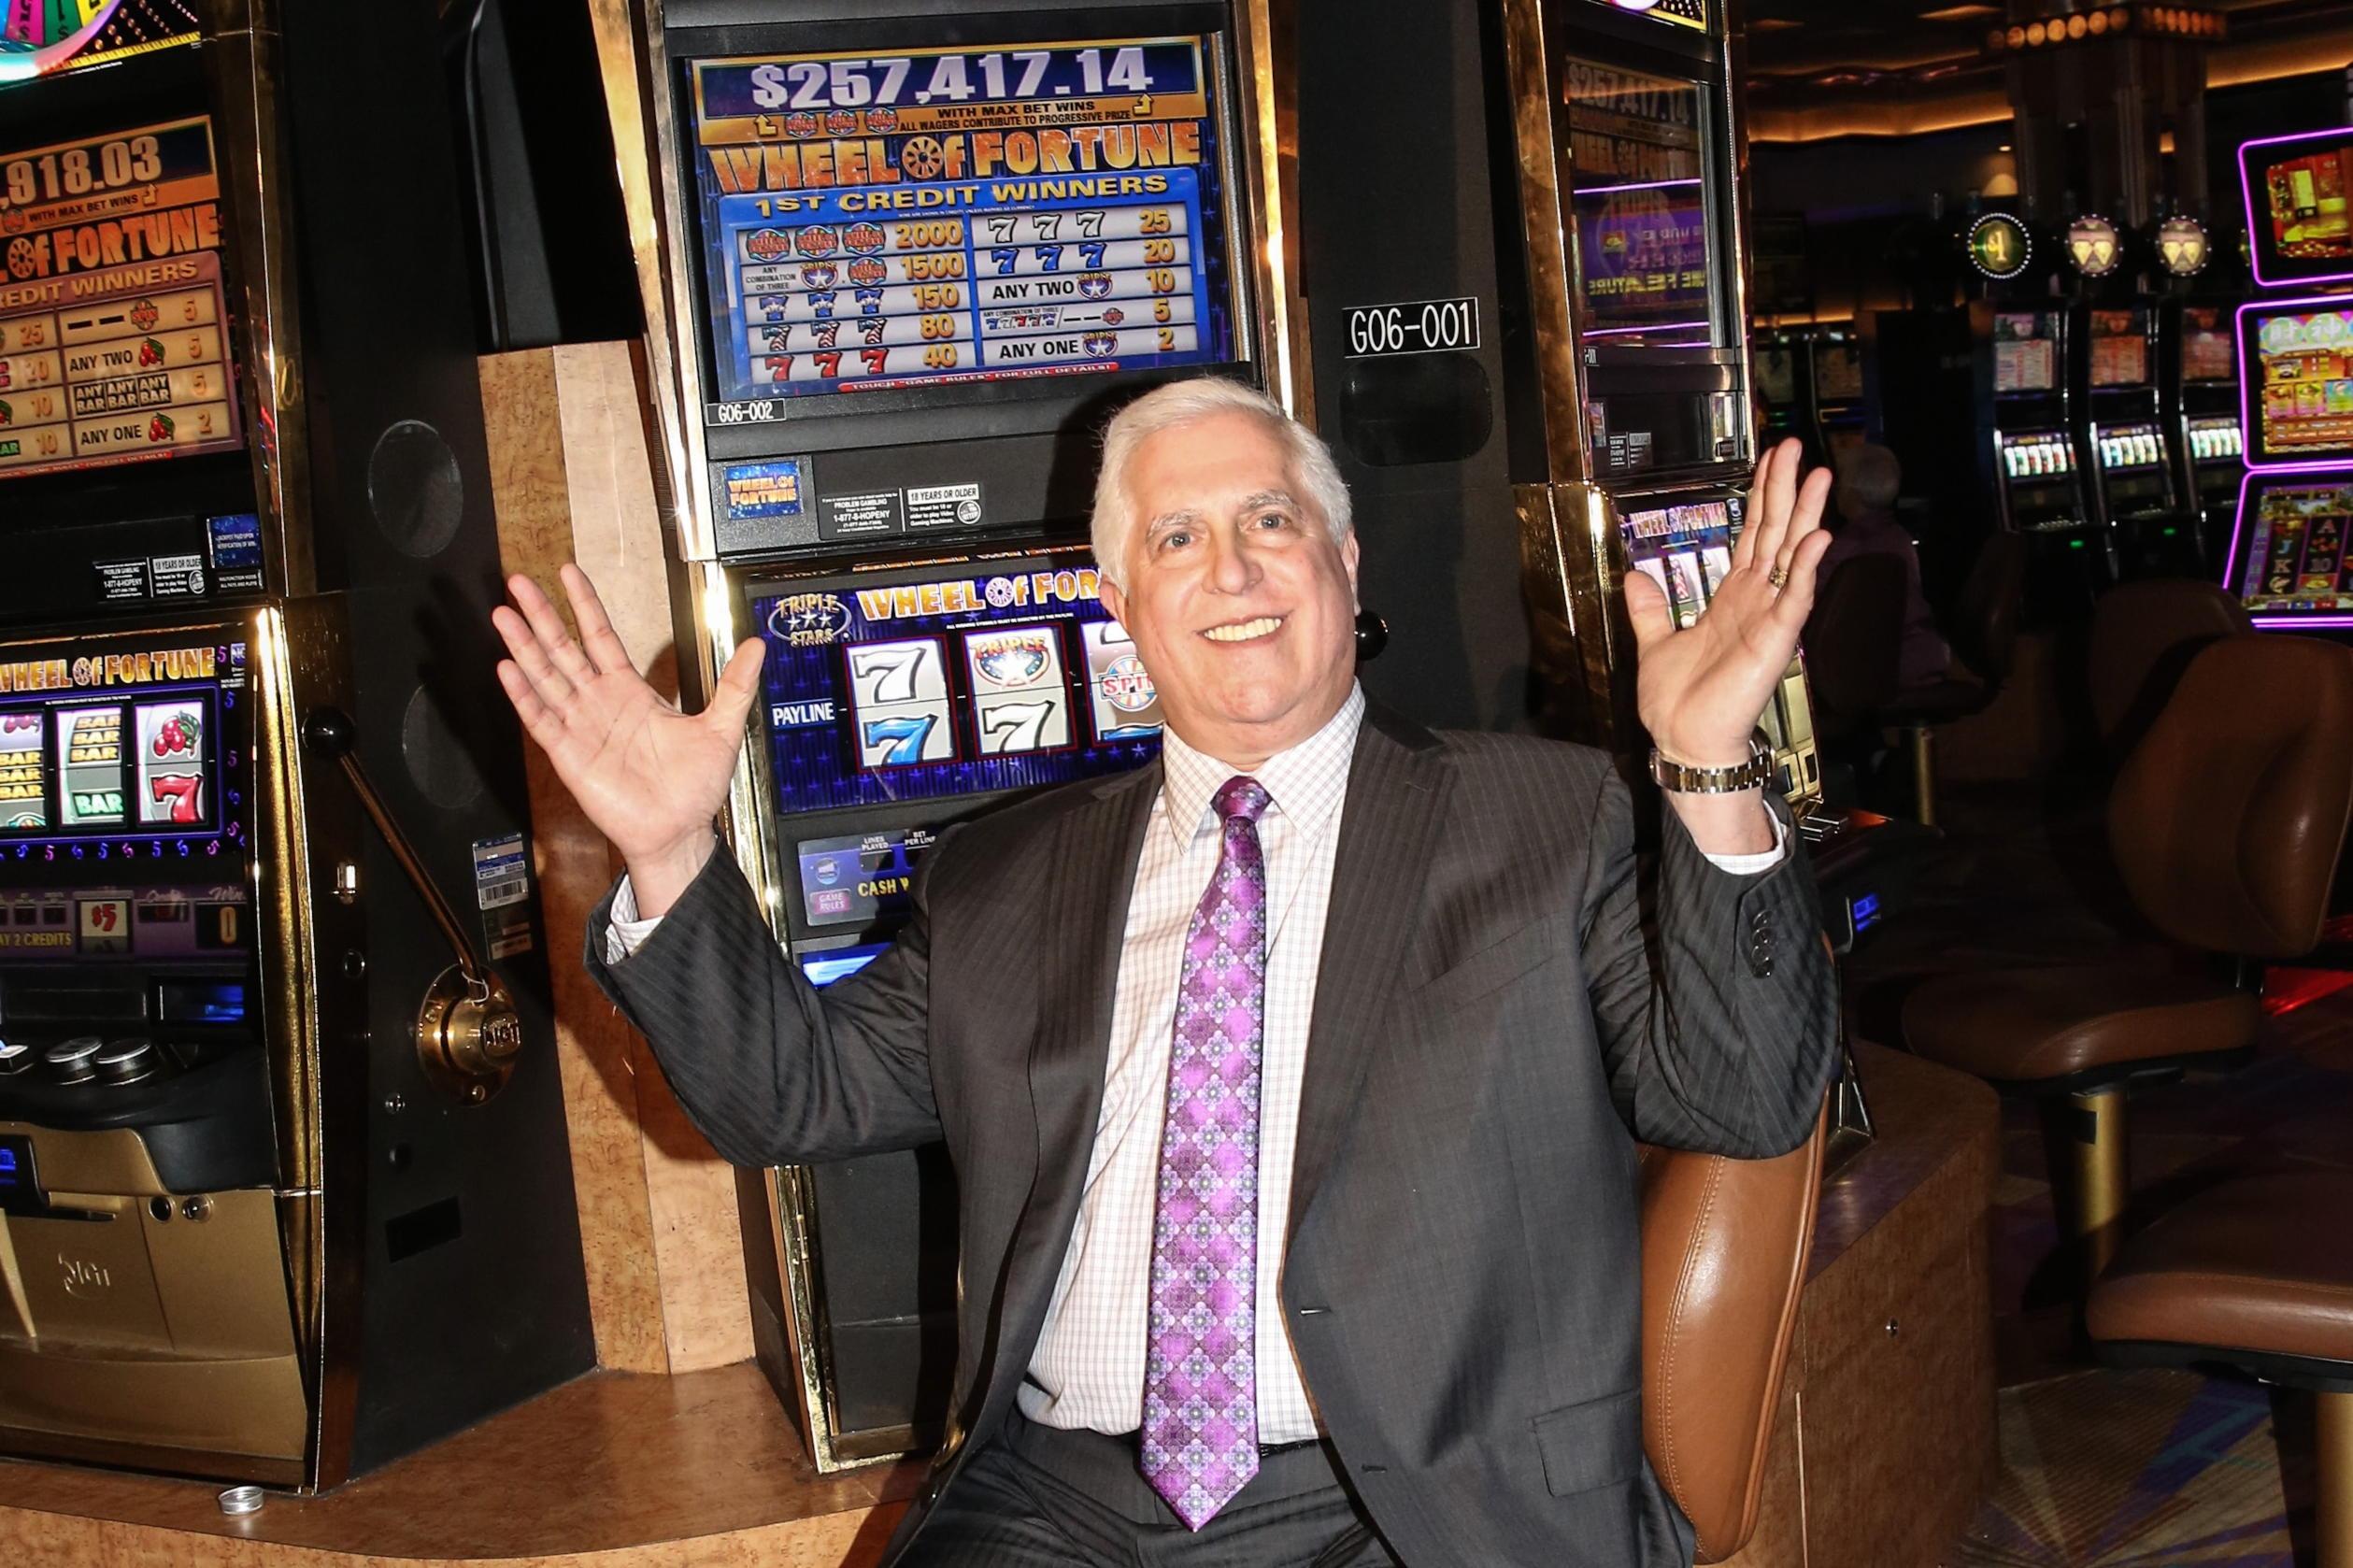 BWin-дегі $ 415 онлайн казино сайысы